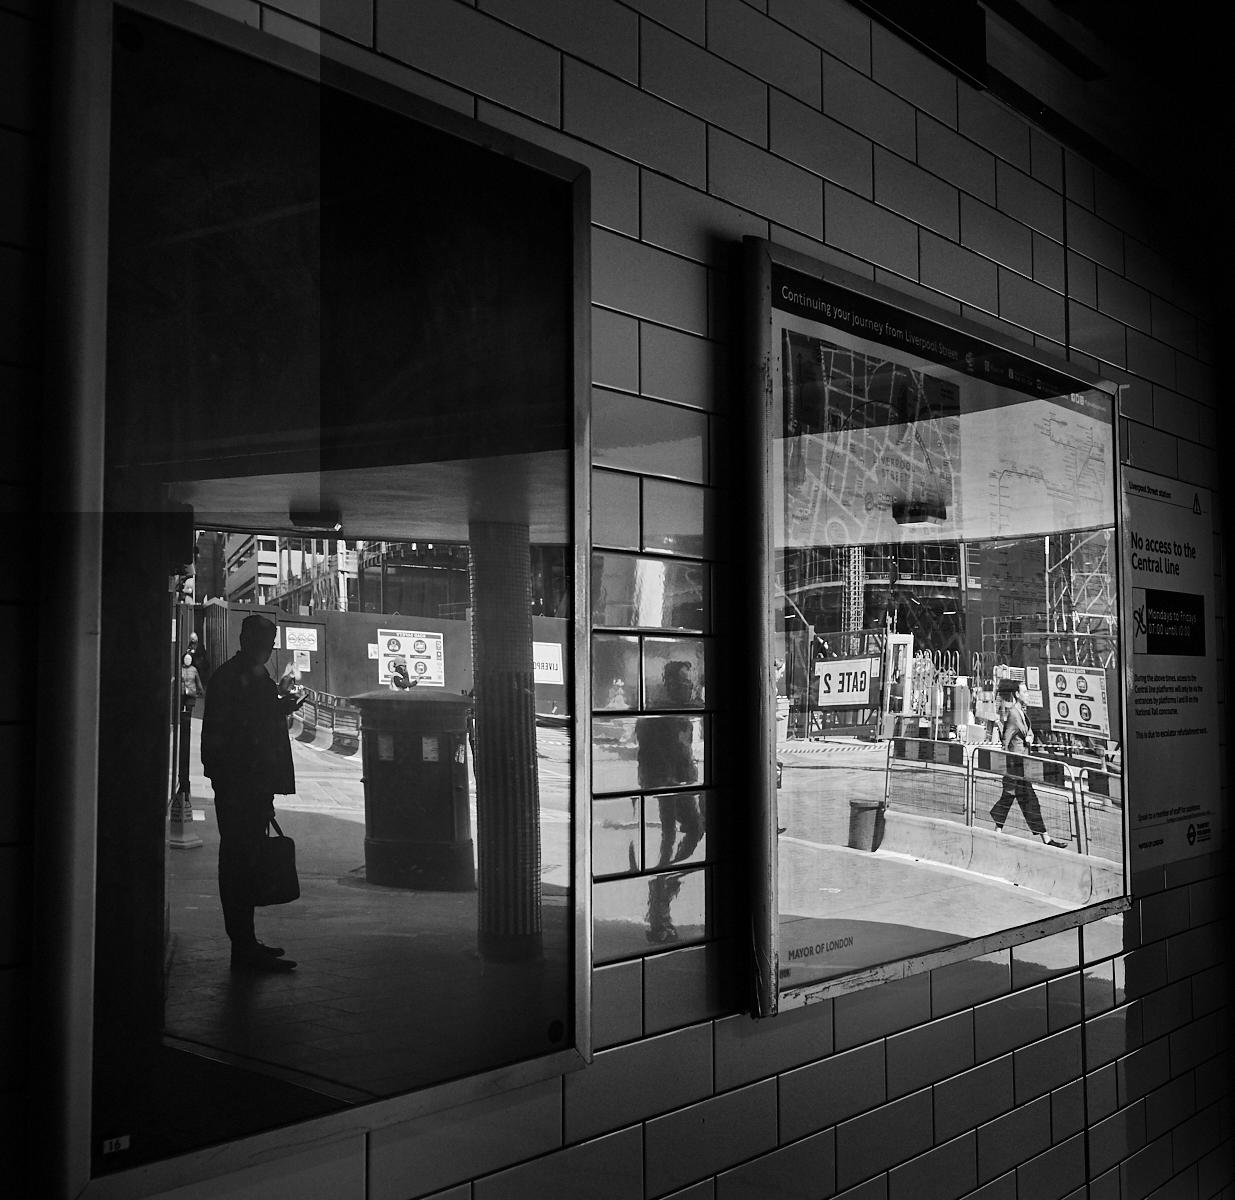 Whitechapel station1600x1200 sRGB 3.jpg